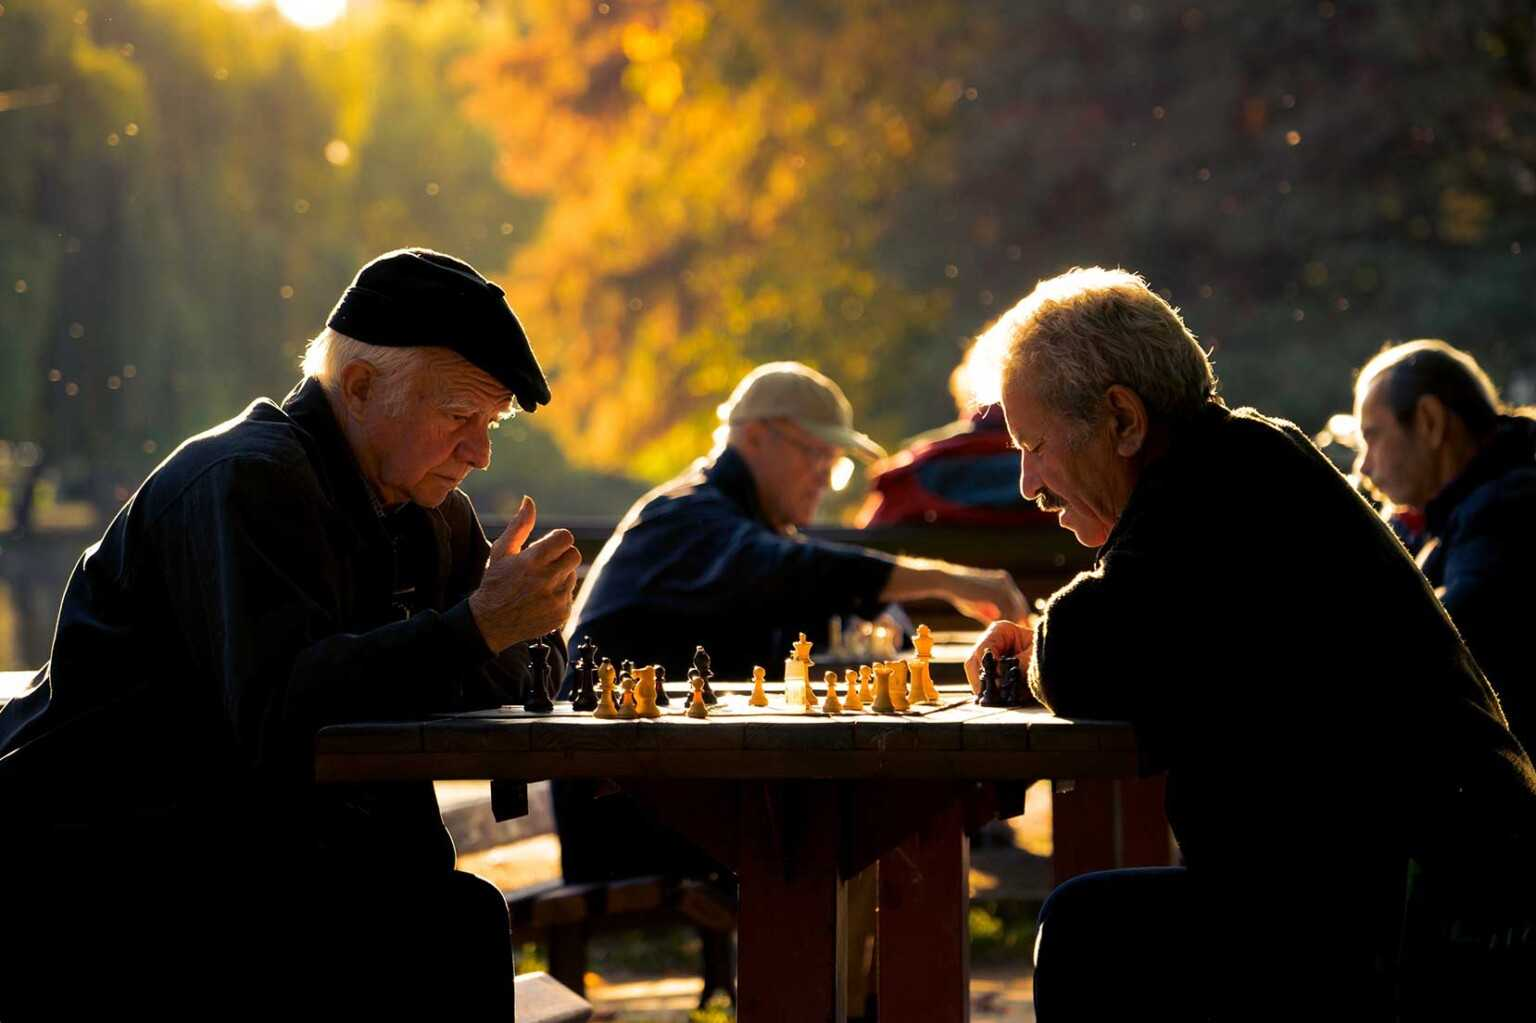 La longevità intellettiva